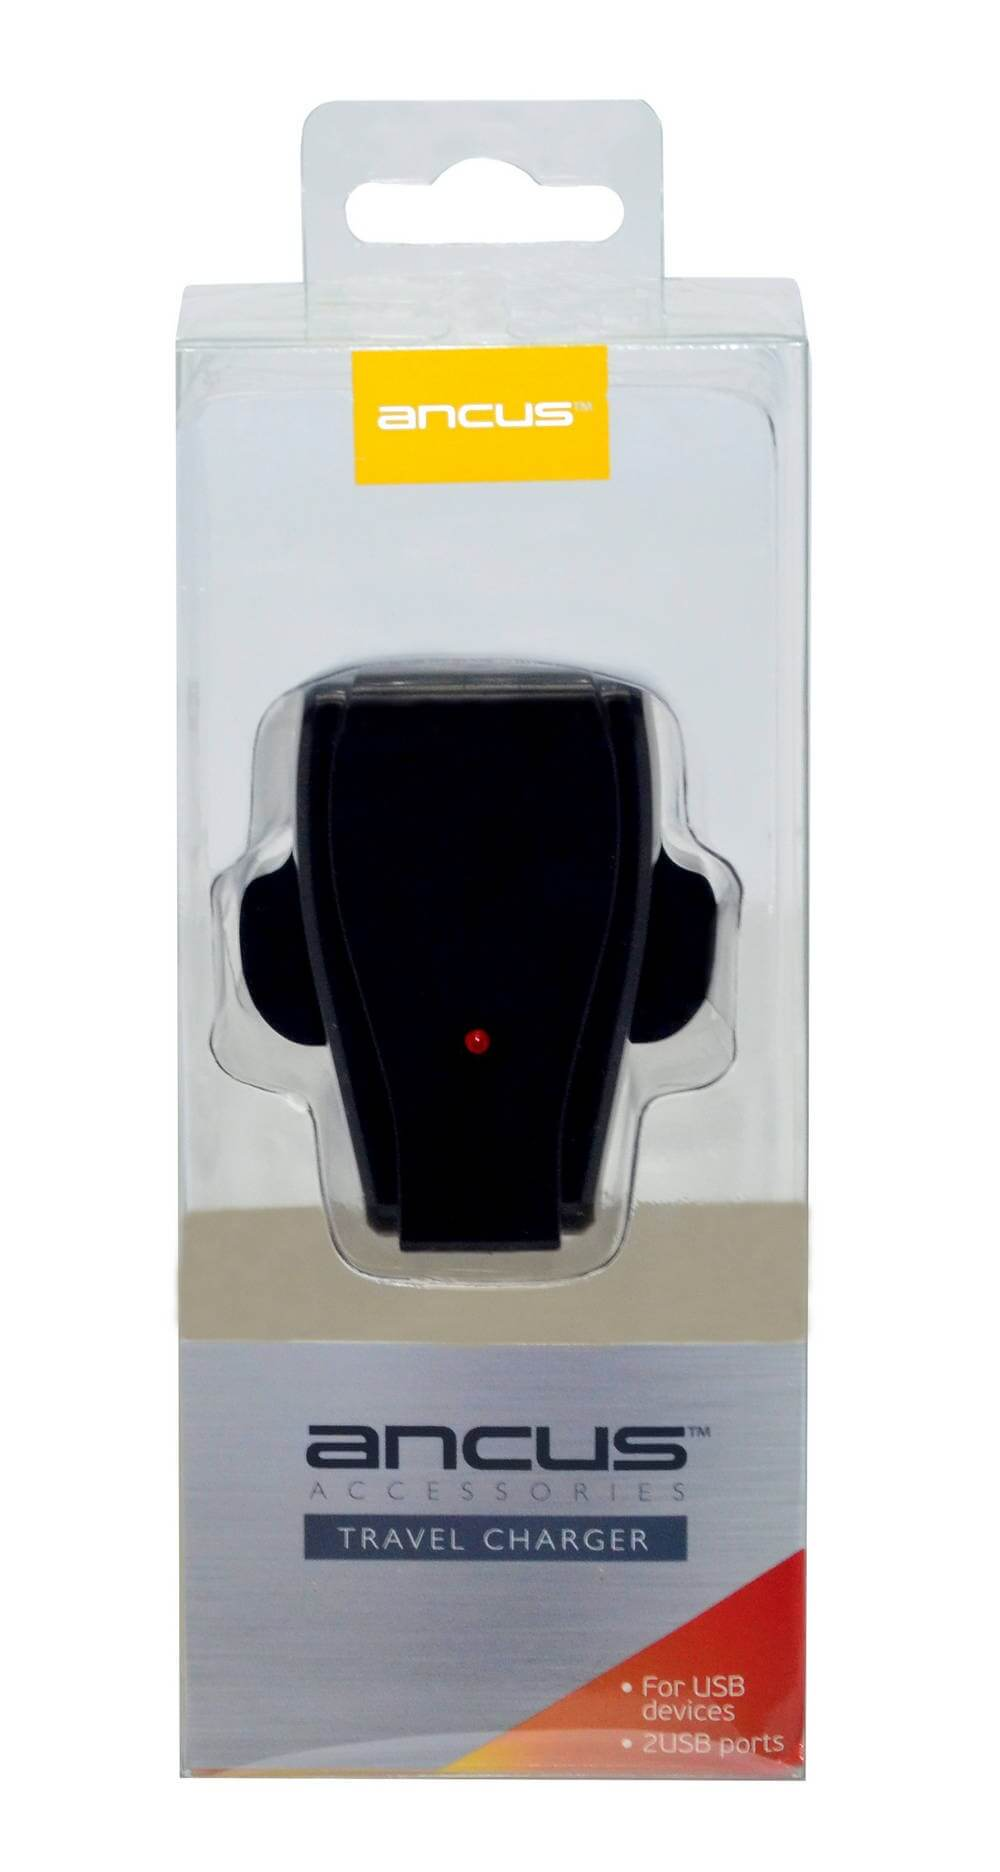 Ancus Dual Usb 5v 1000 Mah Motorola Xt 321 Defy Mini Black Slate 3 Pin